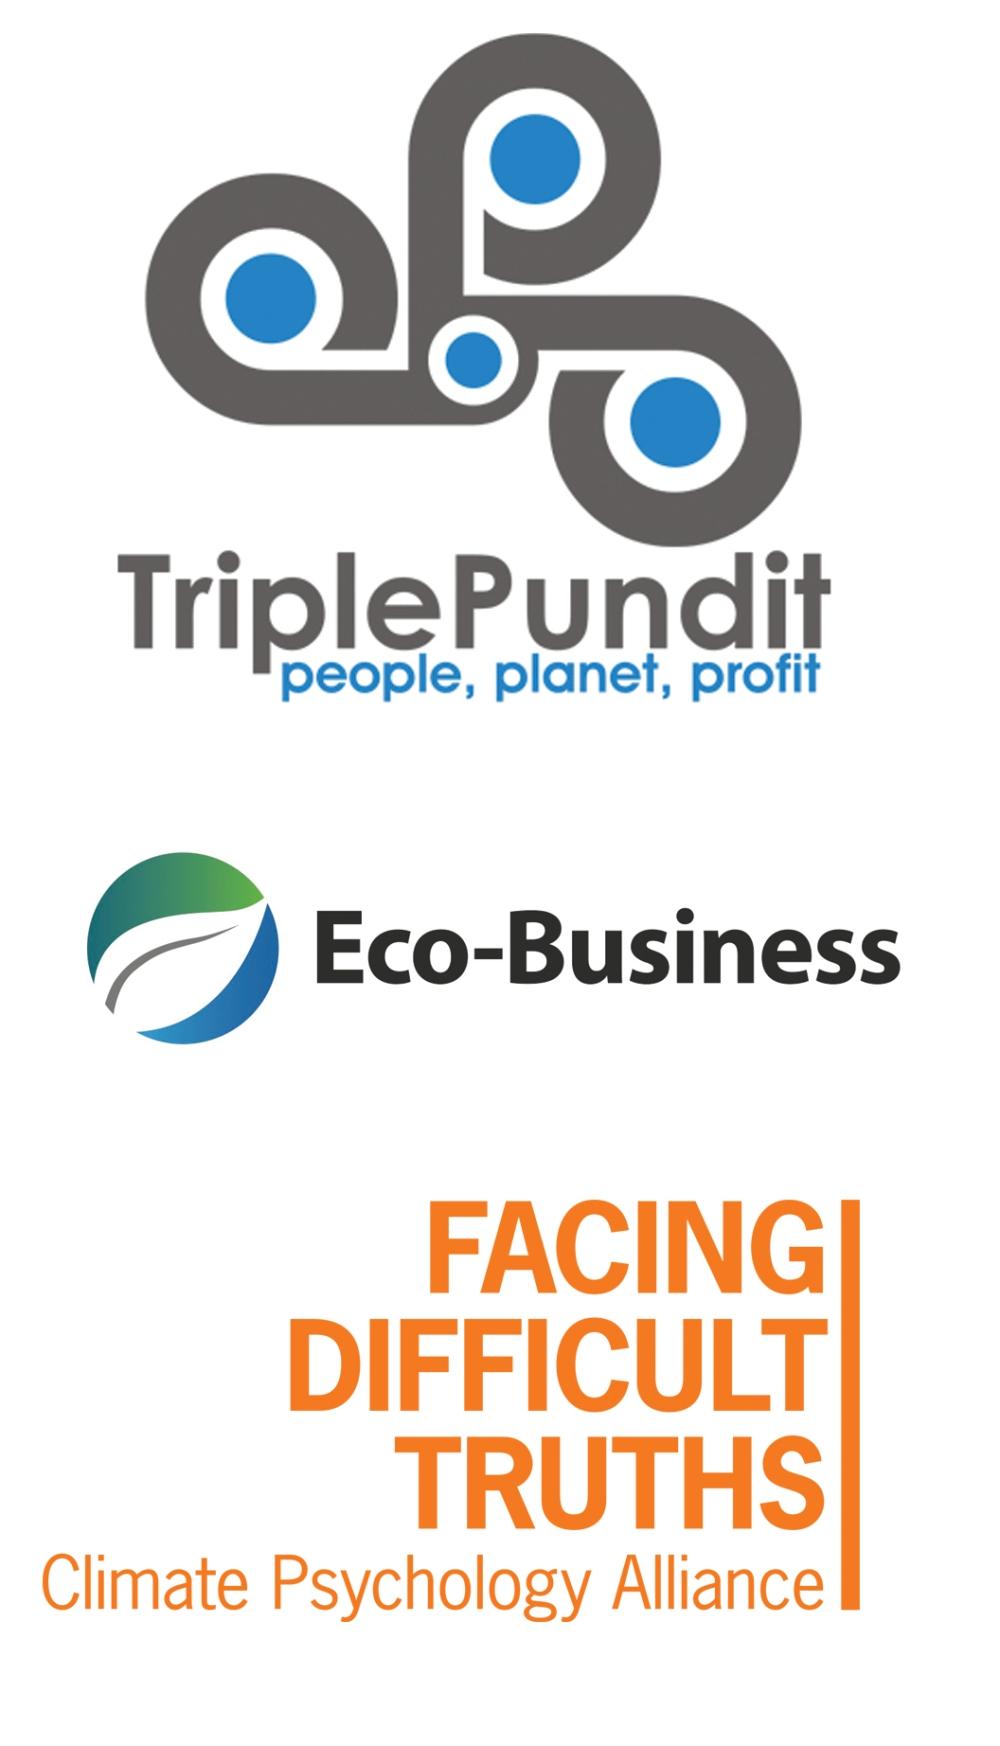 TriplePundit, Eco-Business.com, Climate Psychology Alliance CPA